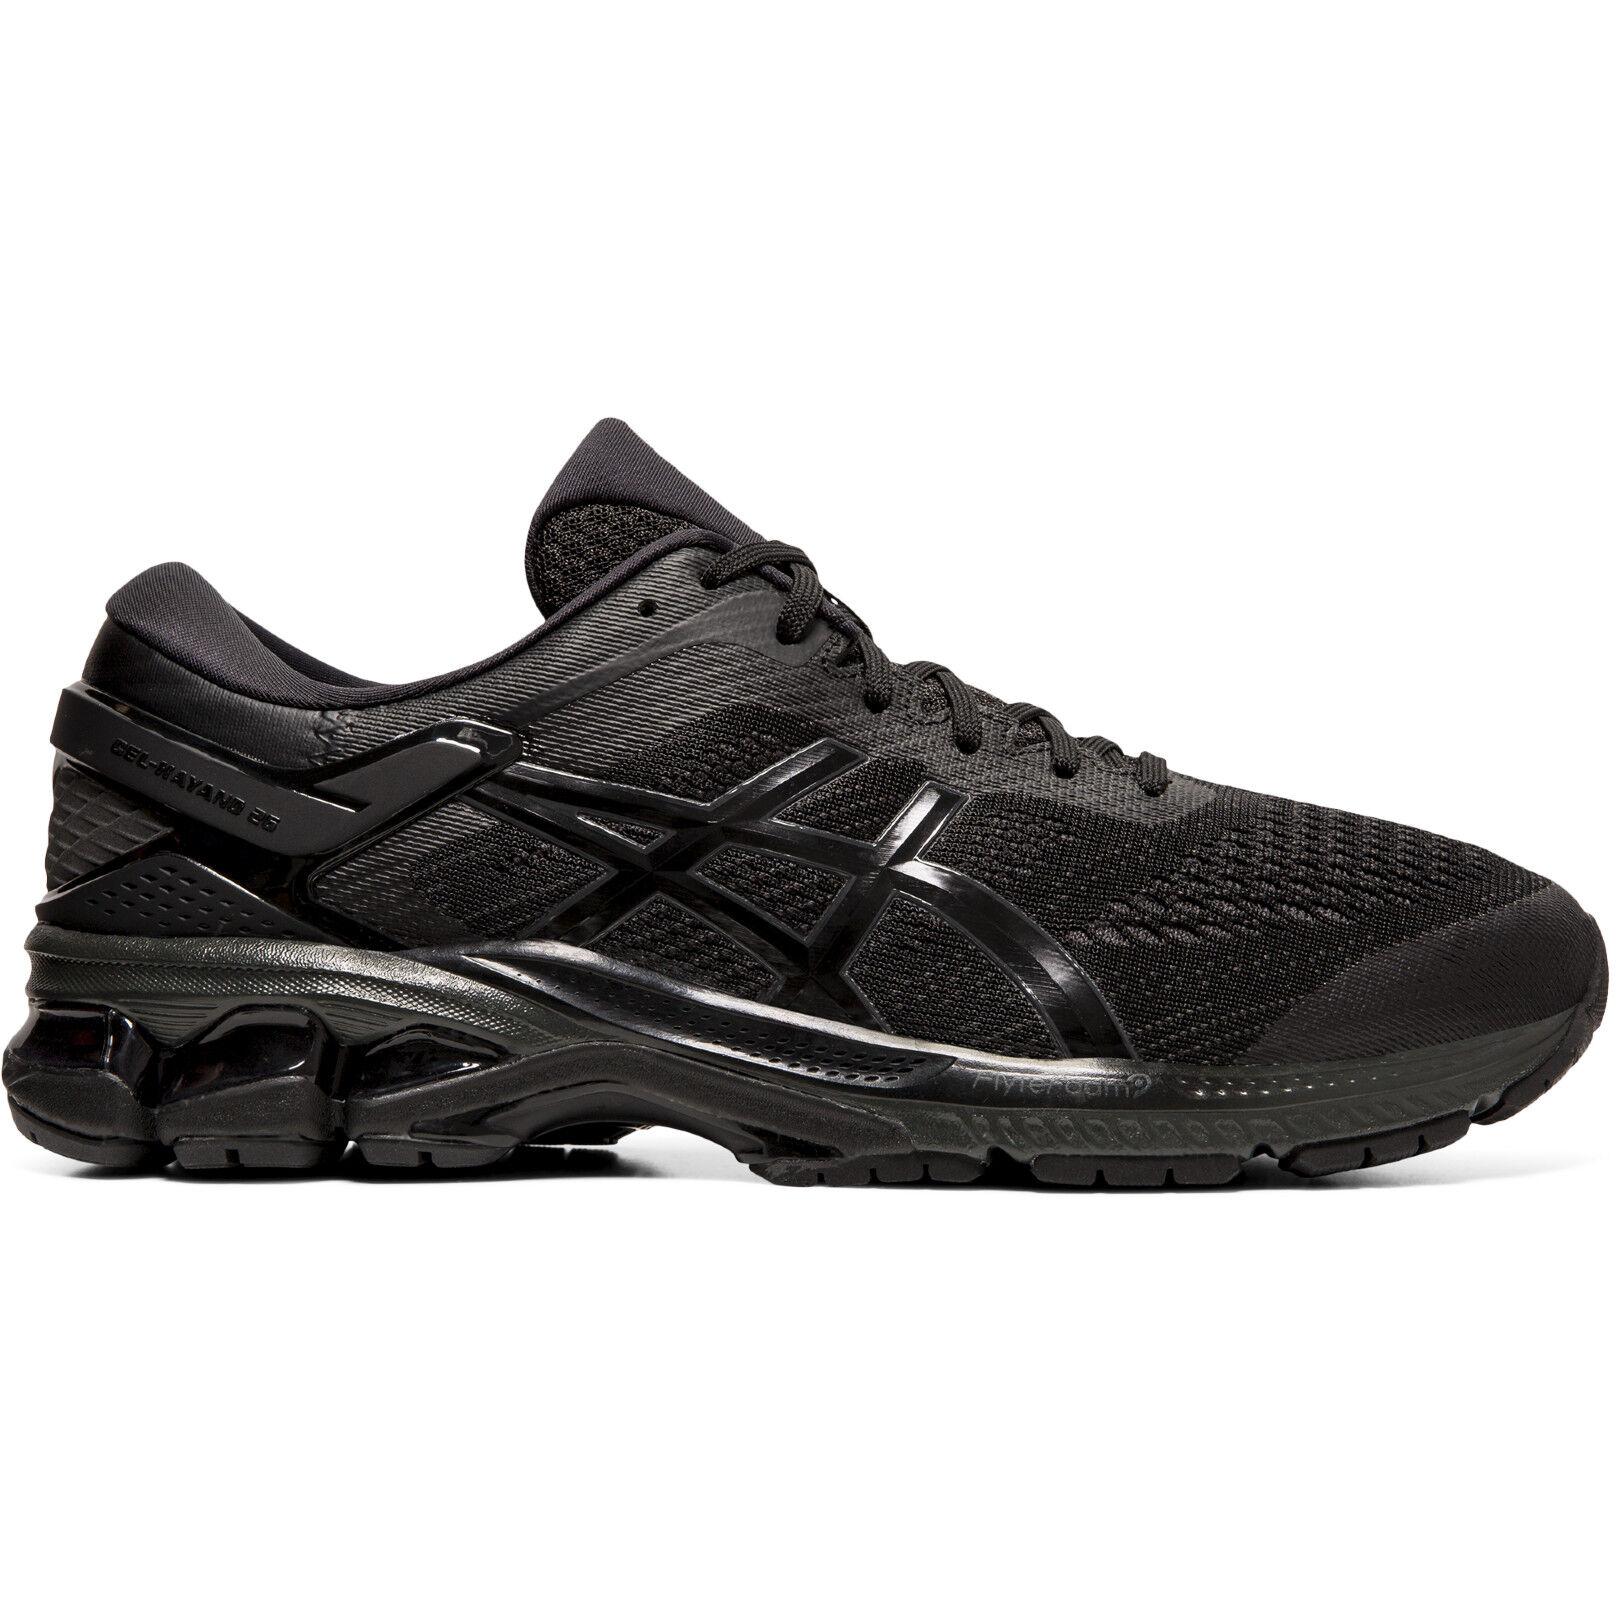 asics Gel Kayano 26 Schuhe Herren blackblack